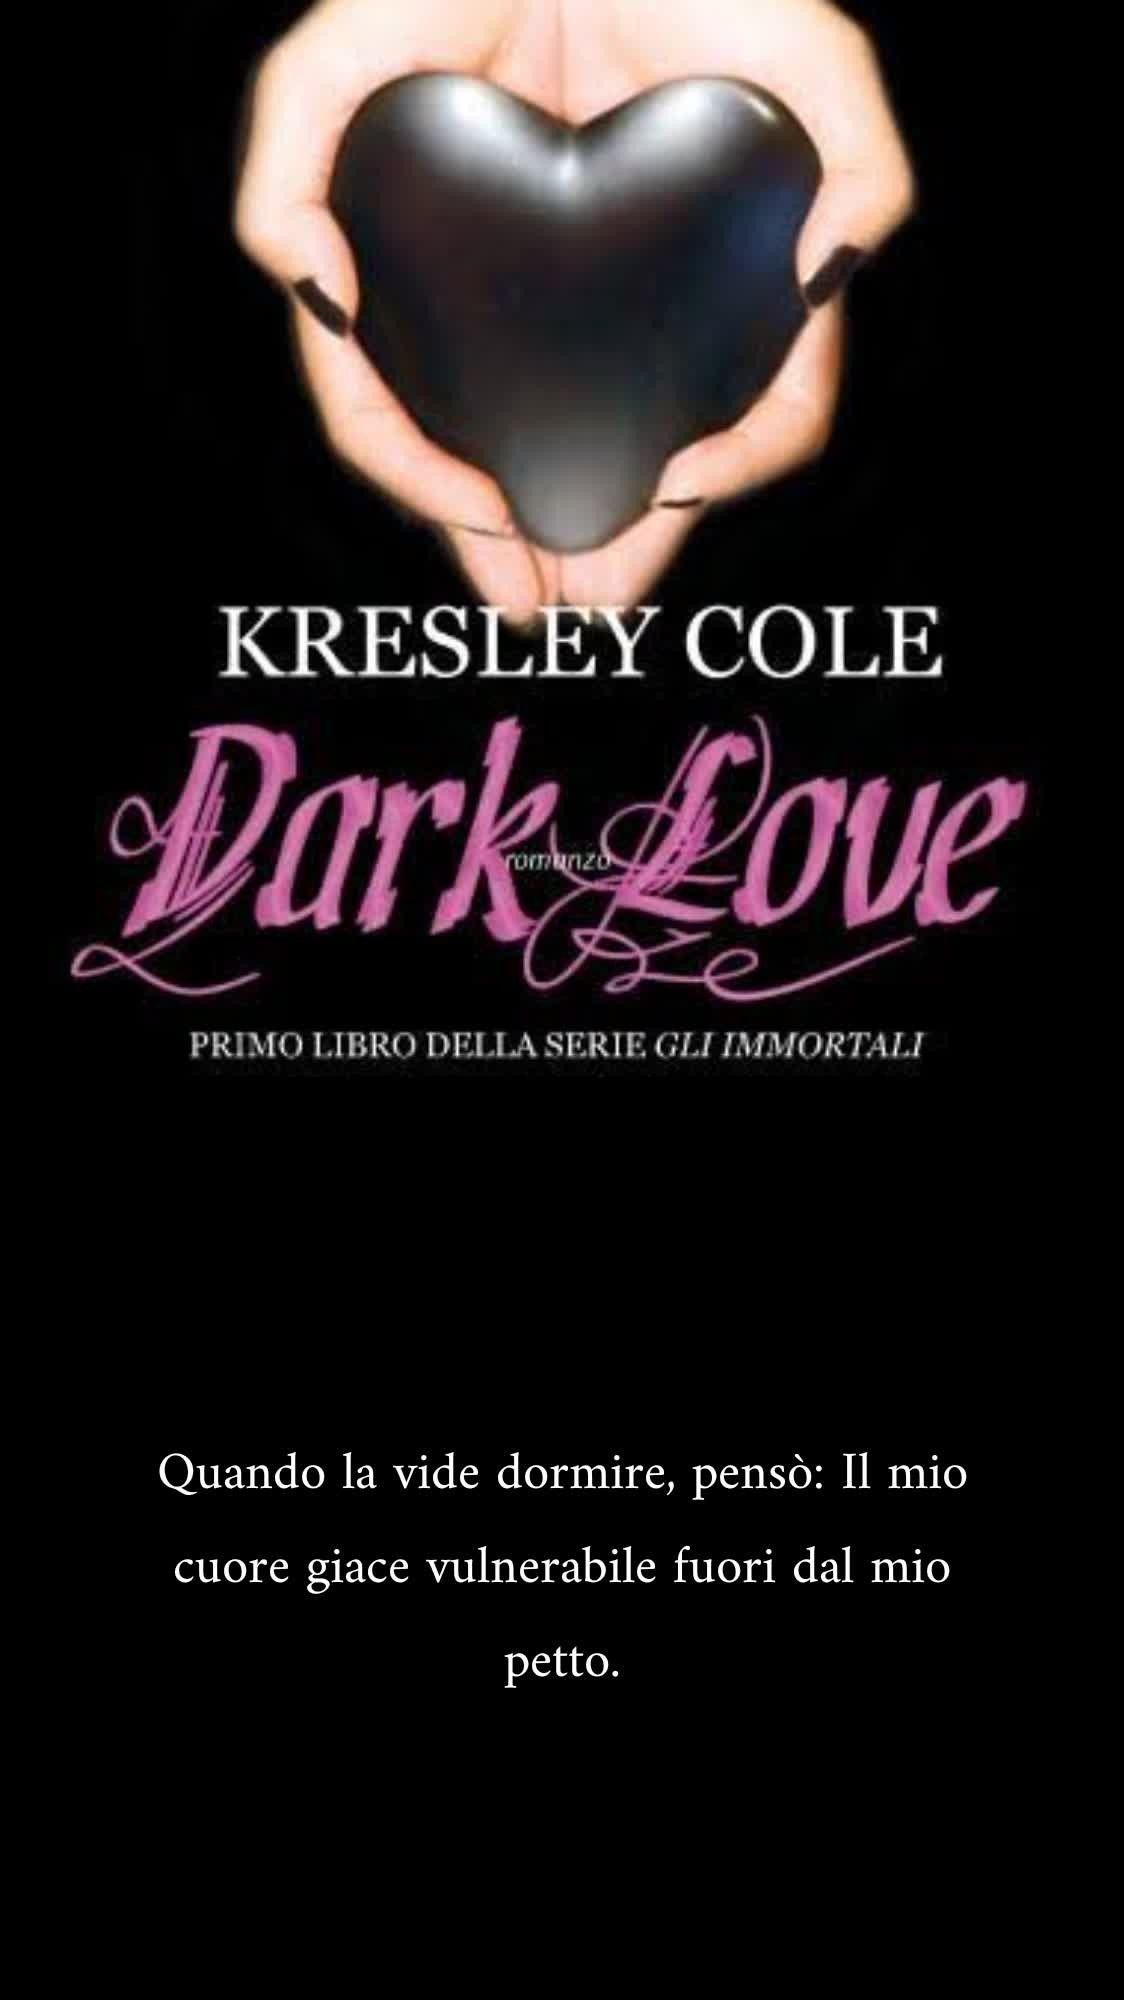 Dark Love Kresley Cole Libri Citazioni